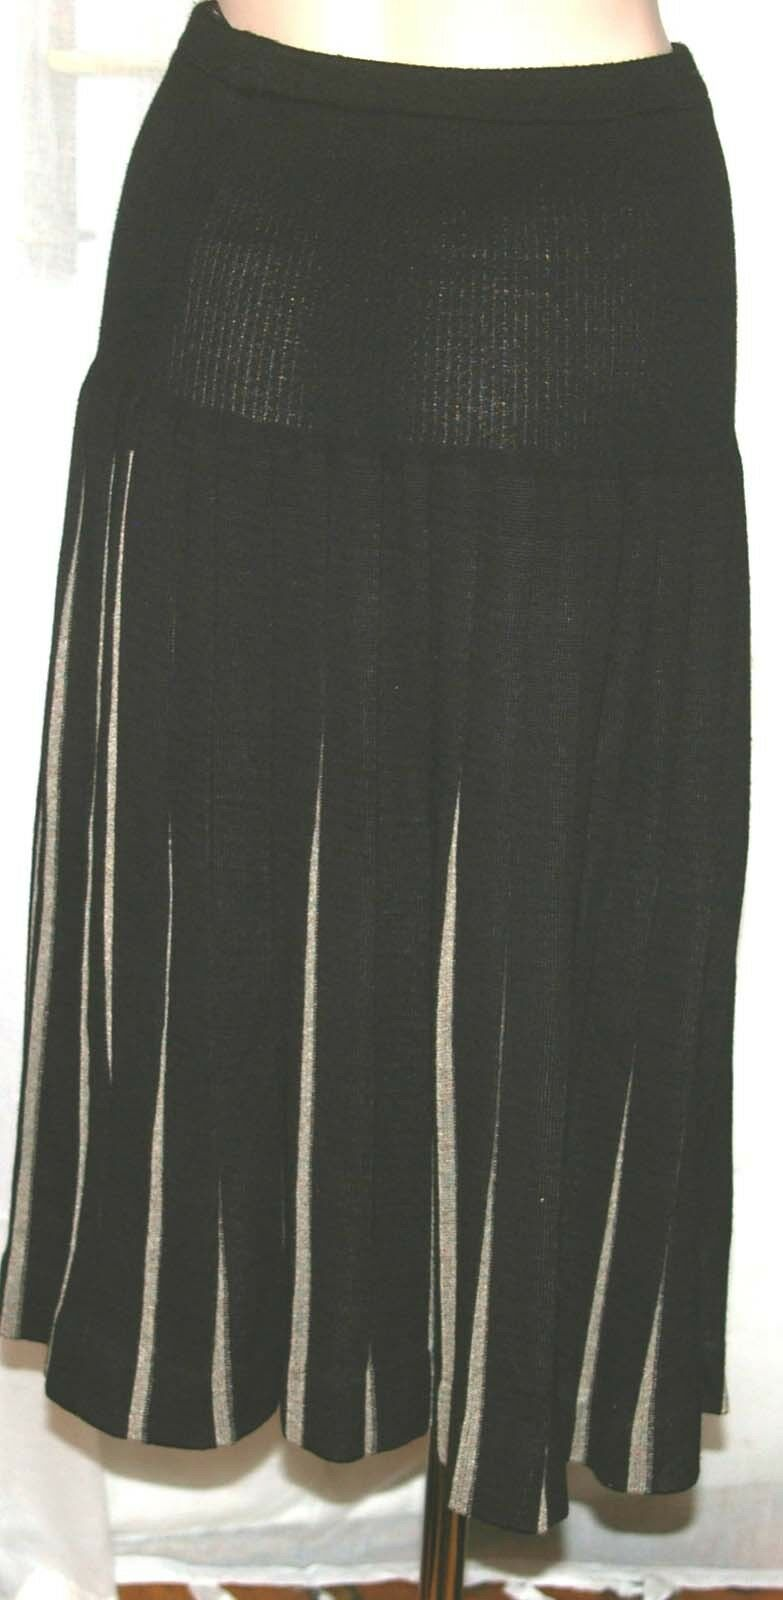 Kriss Sweden _ Knit Skirt Black _ Size: S _ Excellent Condition